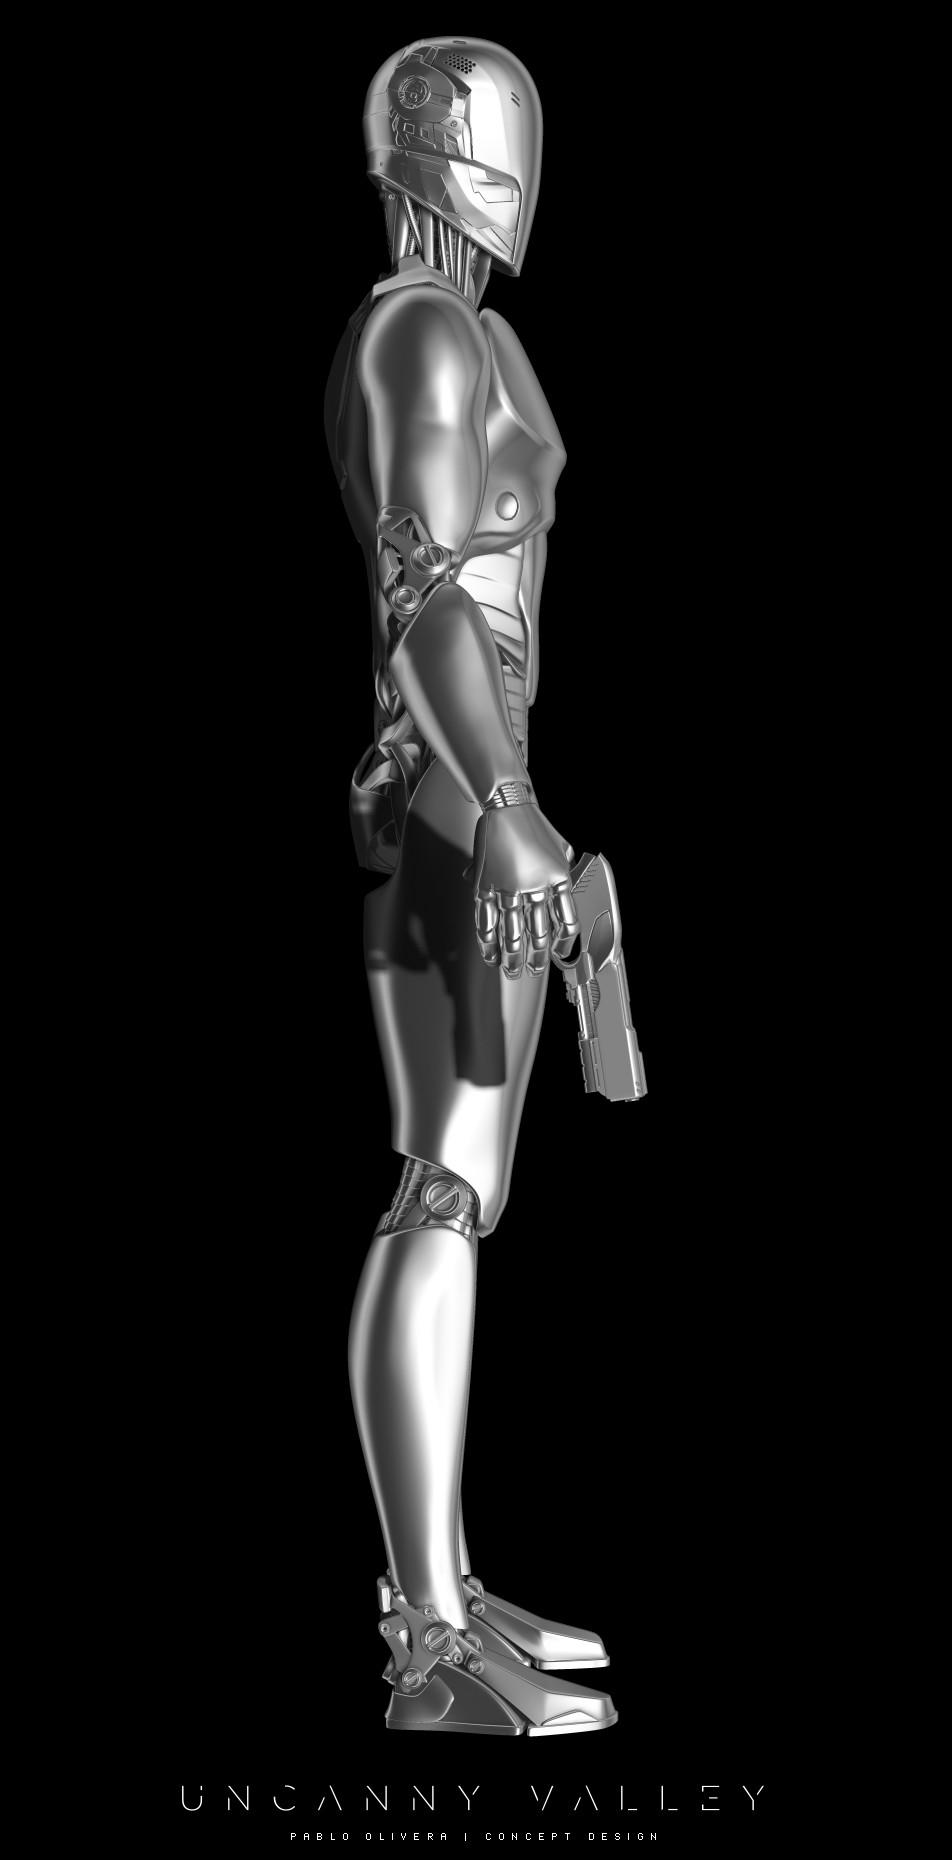 Pablo olivera uncanny valley character design robot 03